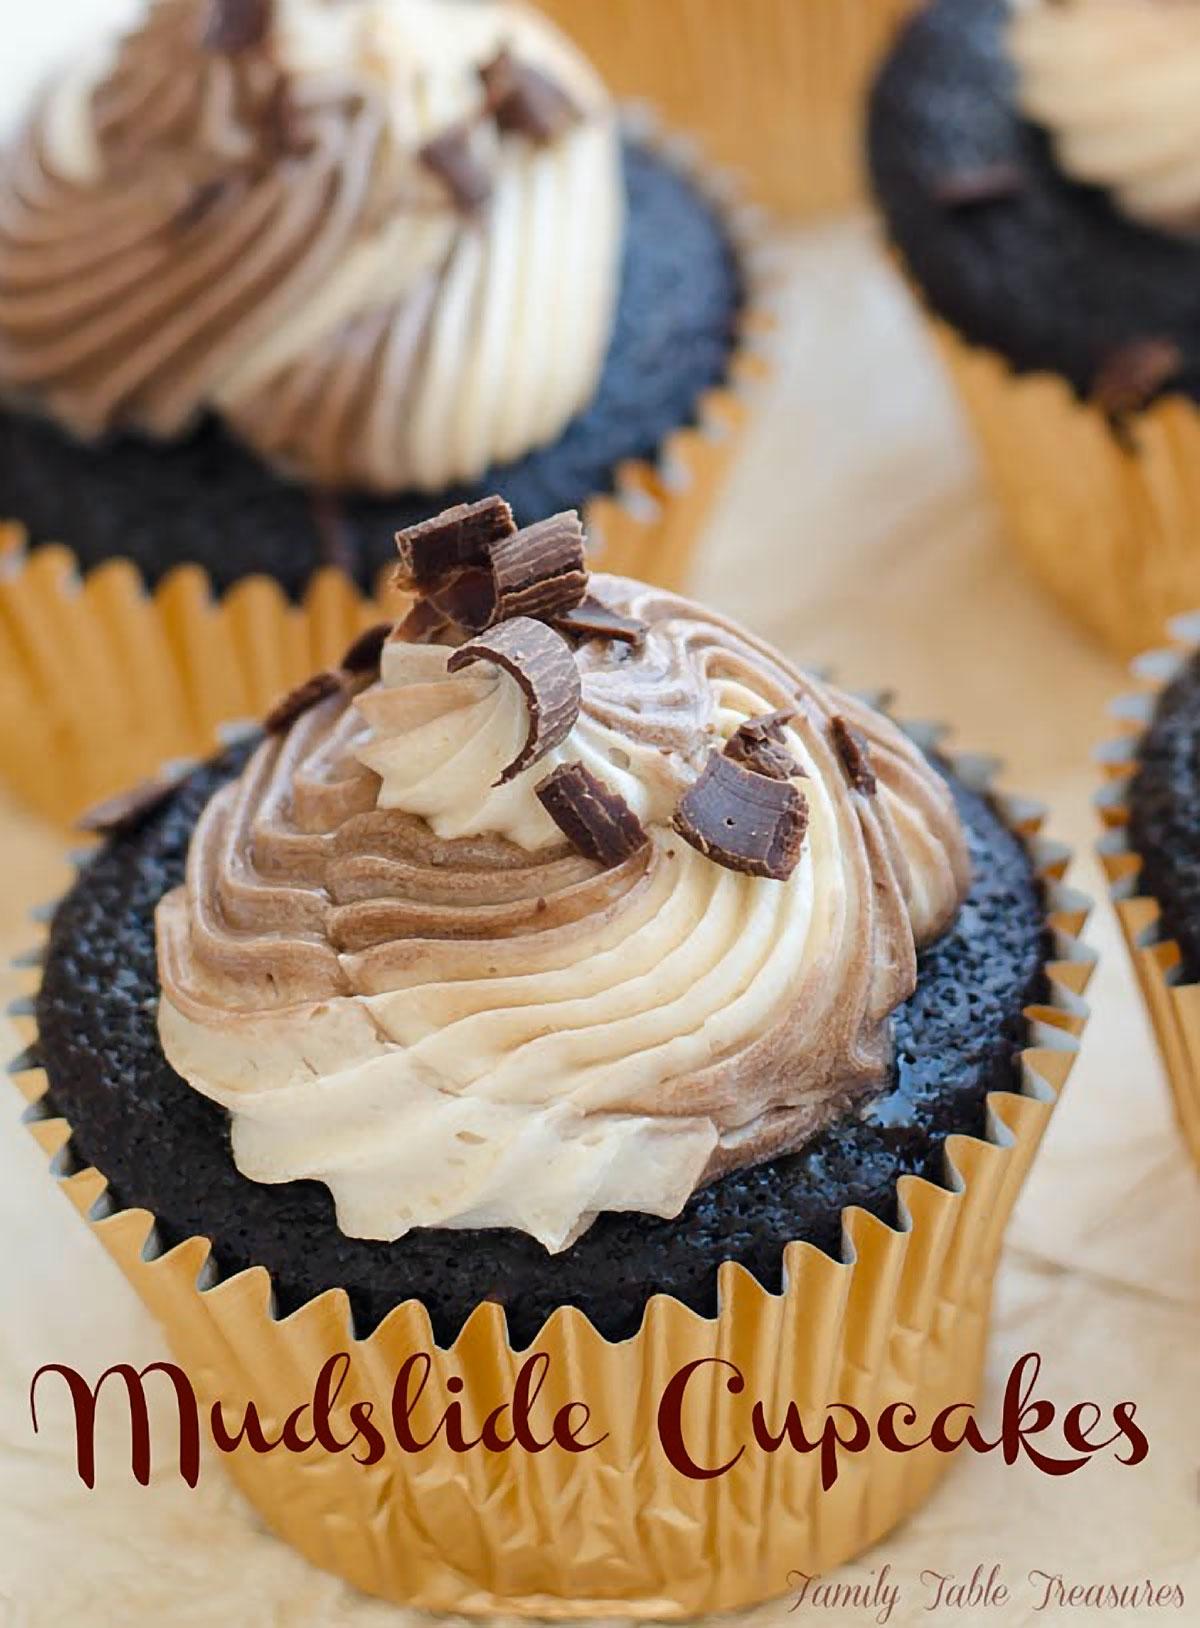 Mudslide Cupcakes Recipe